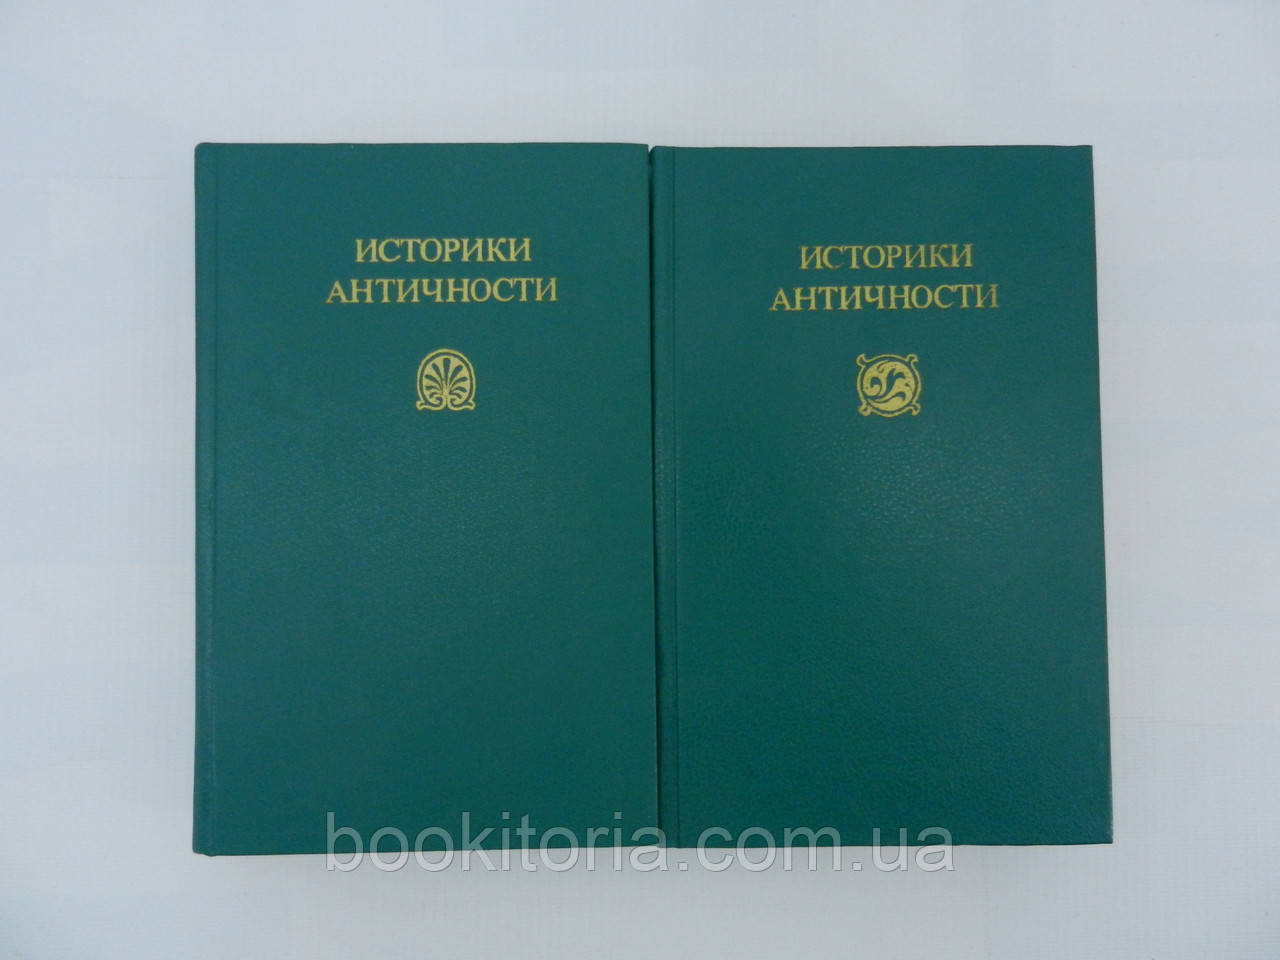 Историки античности. В двух томах (б/у).